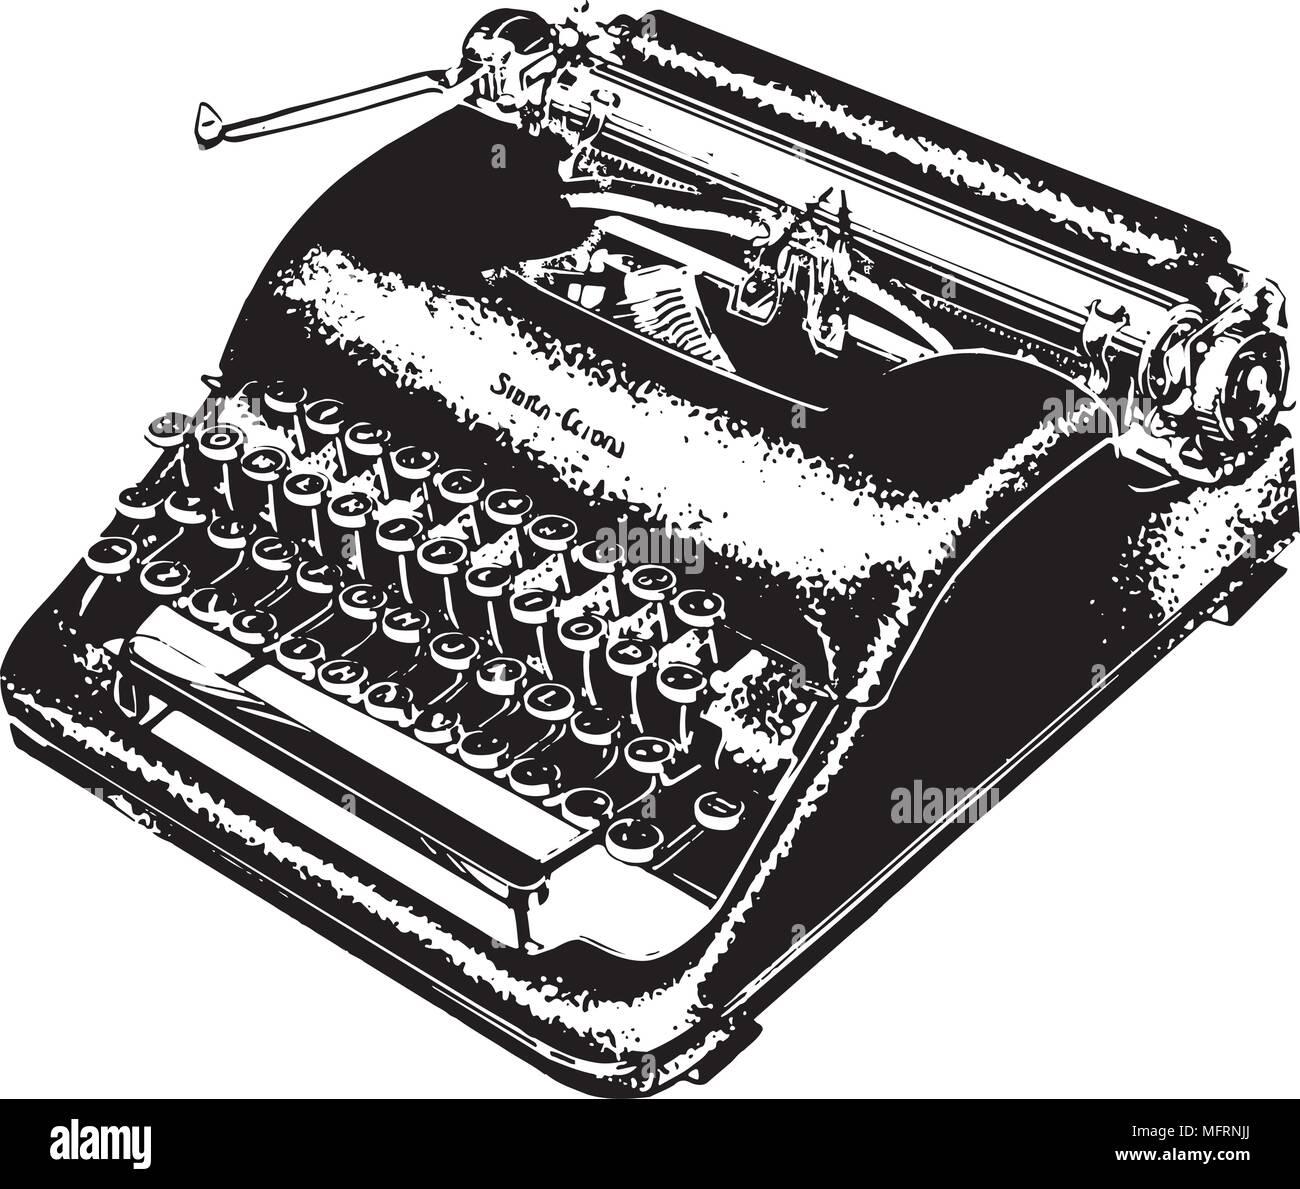 Manual Typewriter - Retro Clipart Illustration - Stock Vector